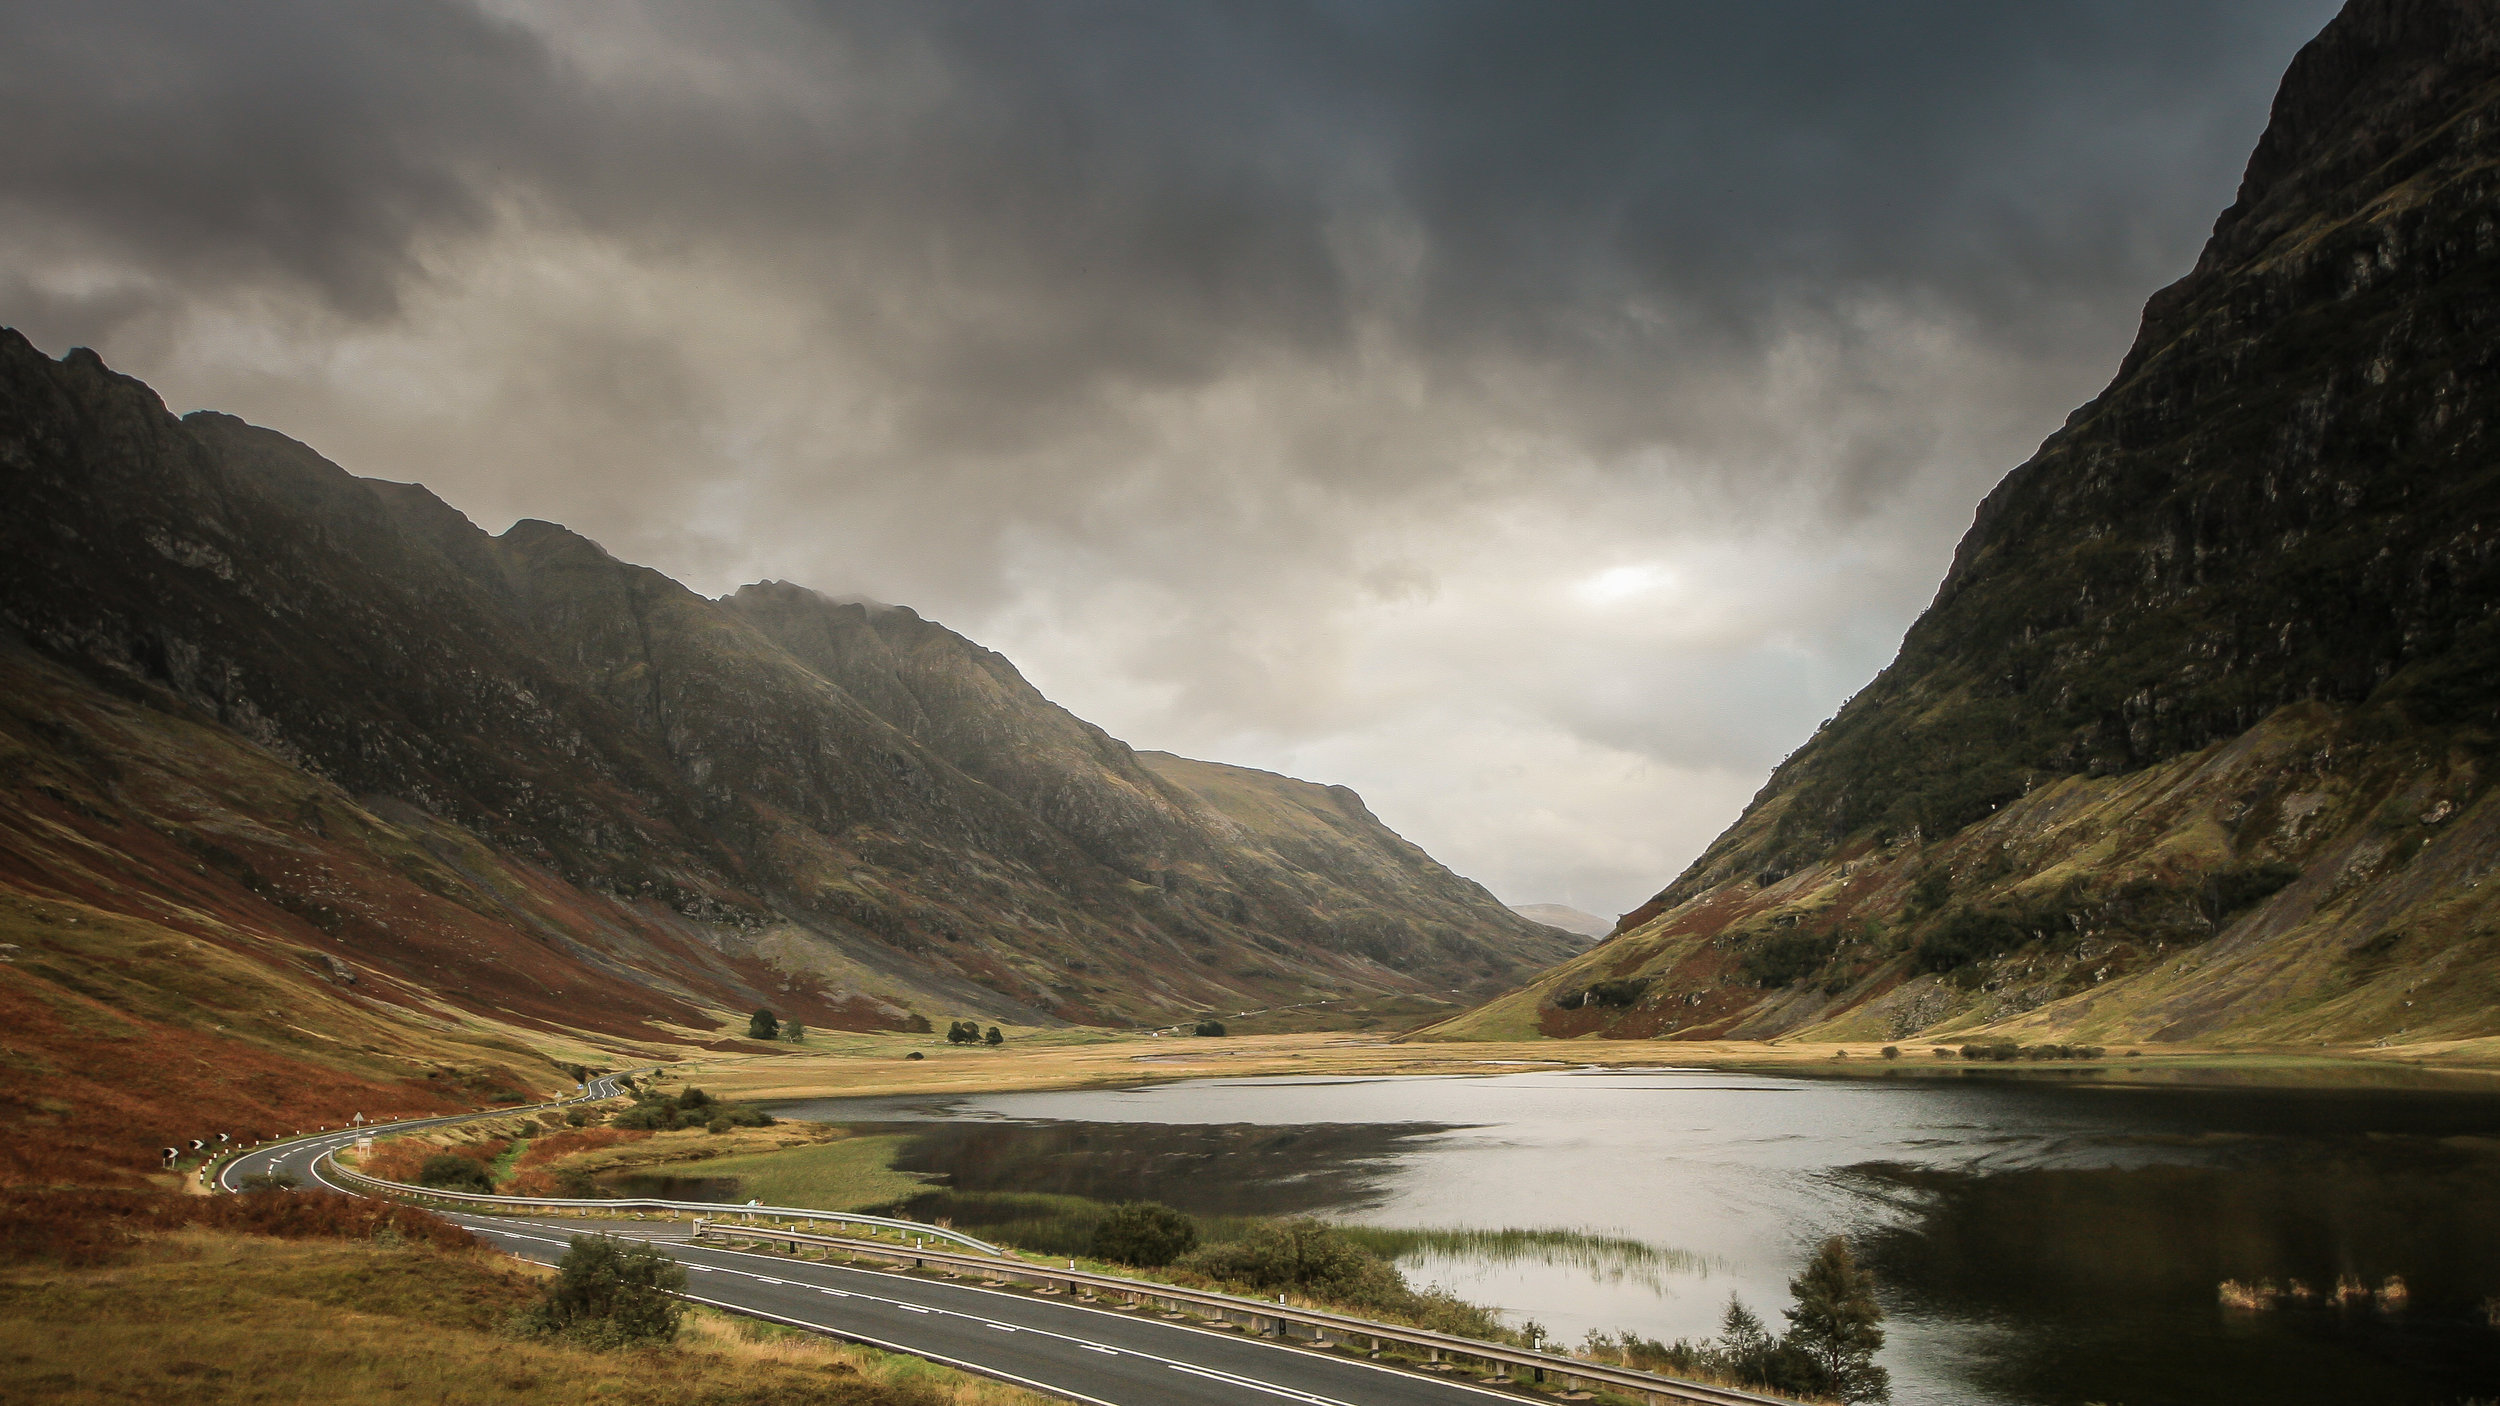 Scotland's impressive Glencoe. Brooding clouds mandatory. Picture: Ben Lindley